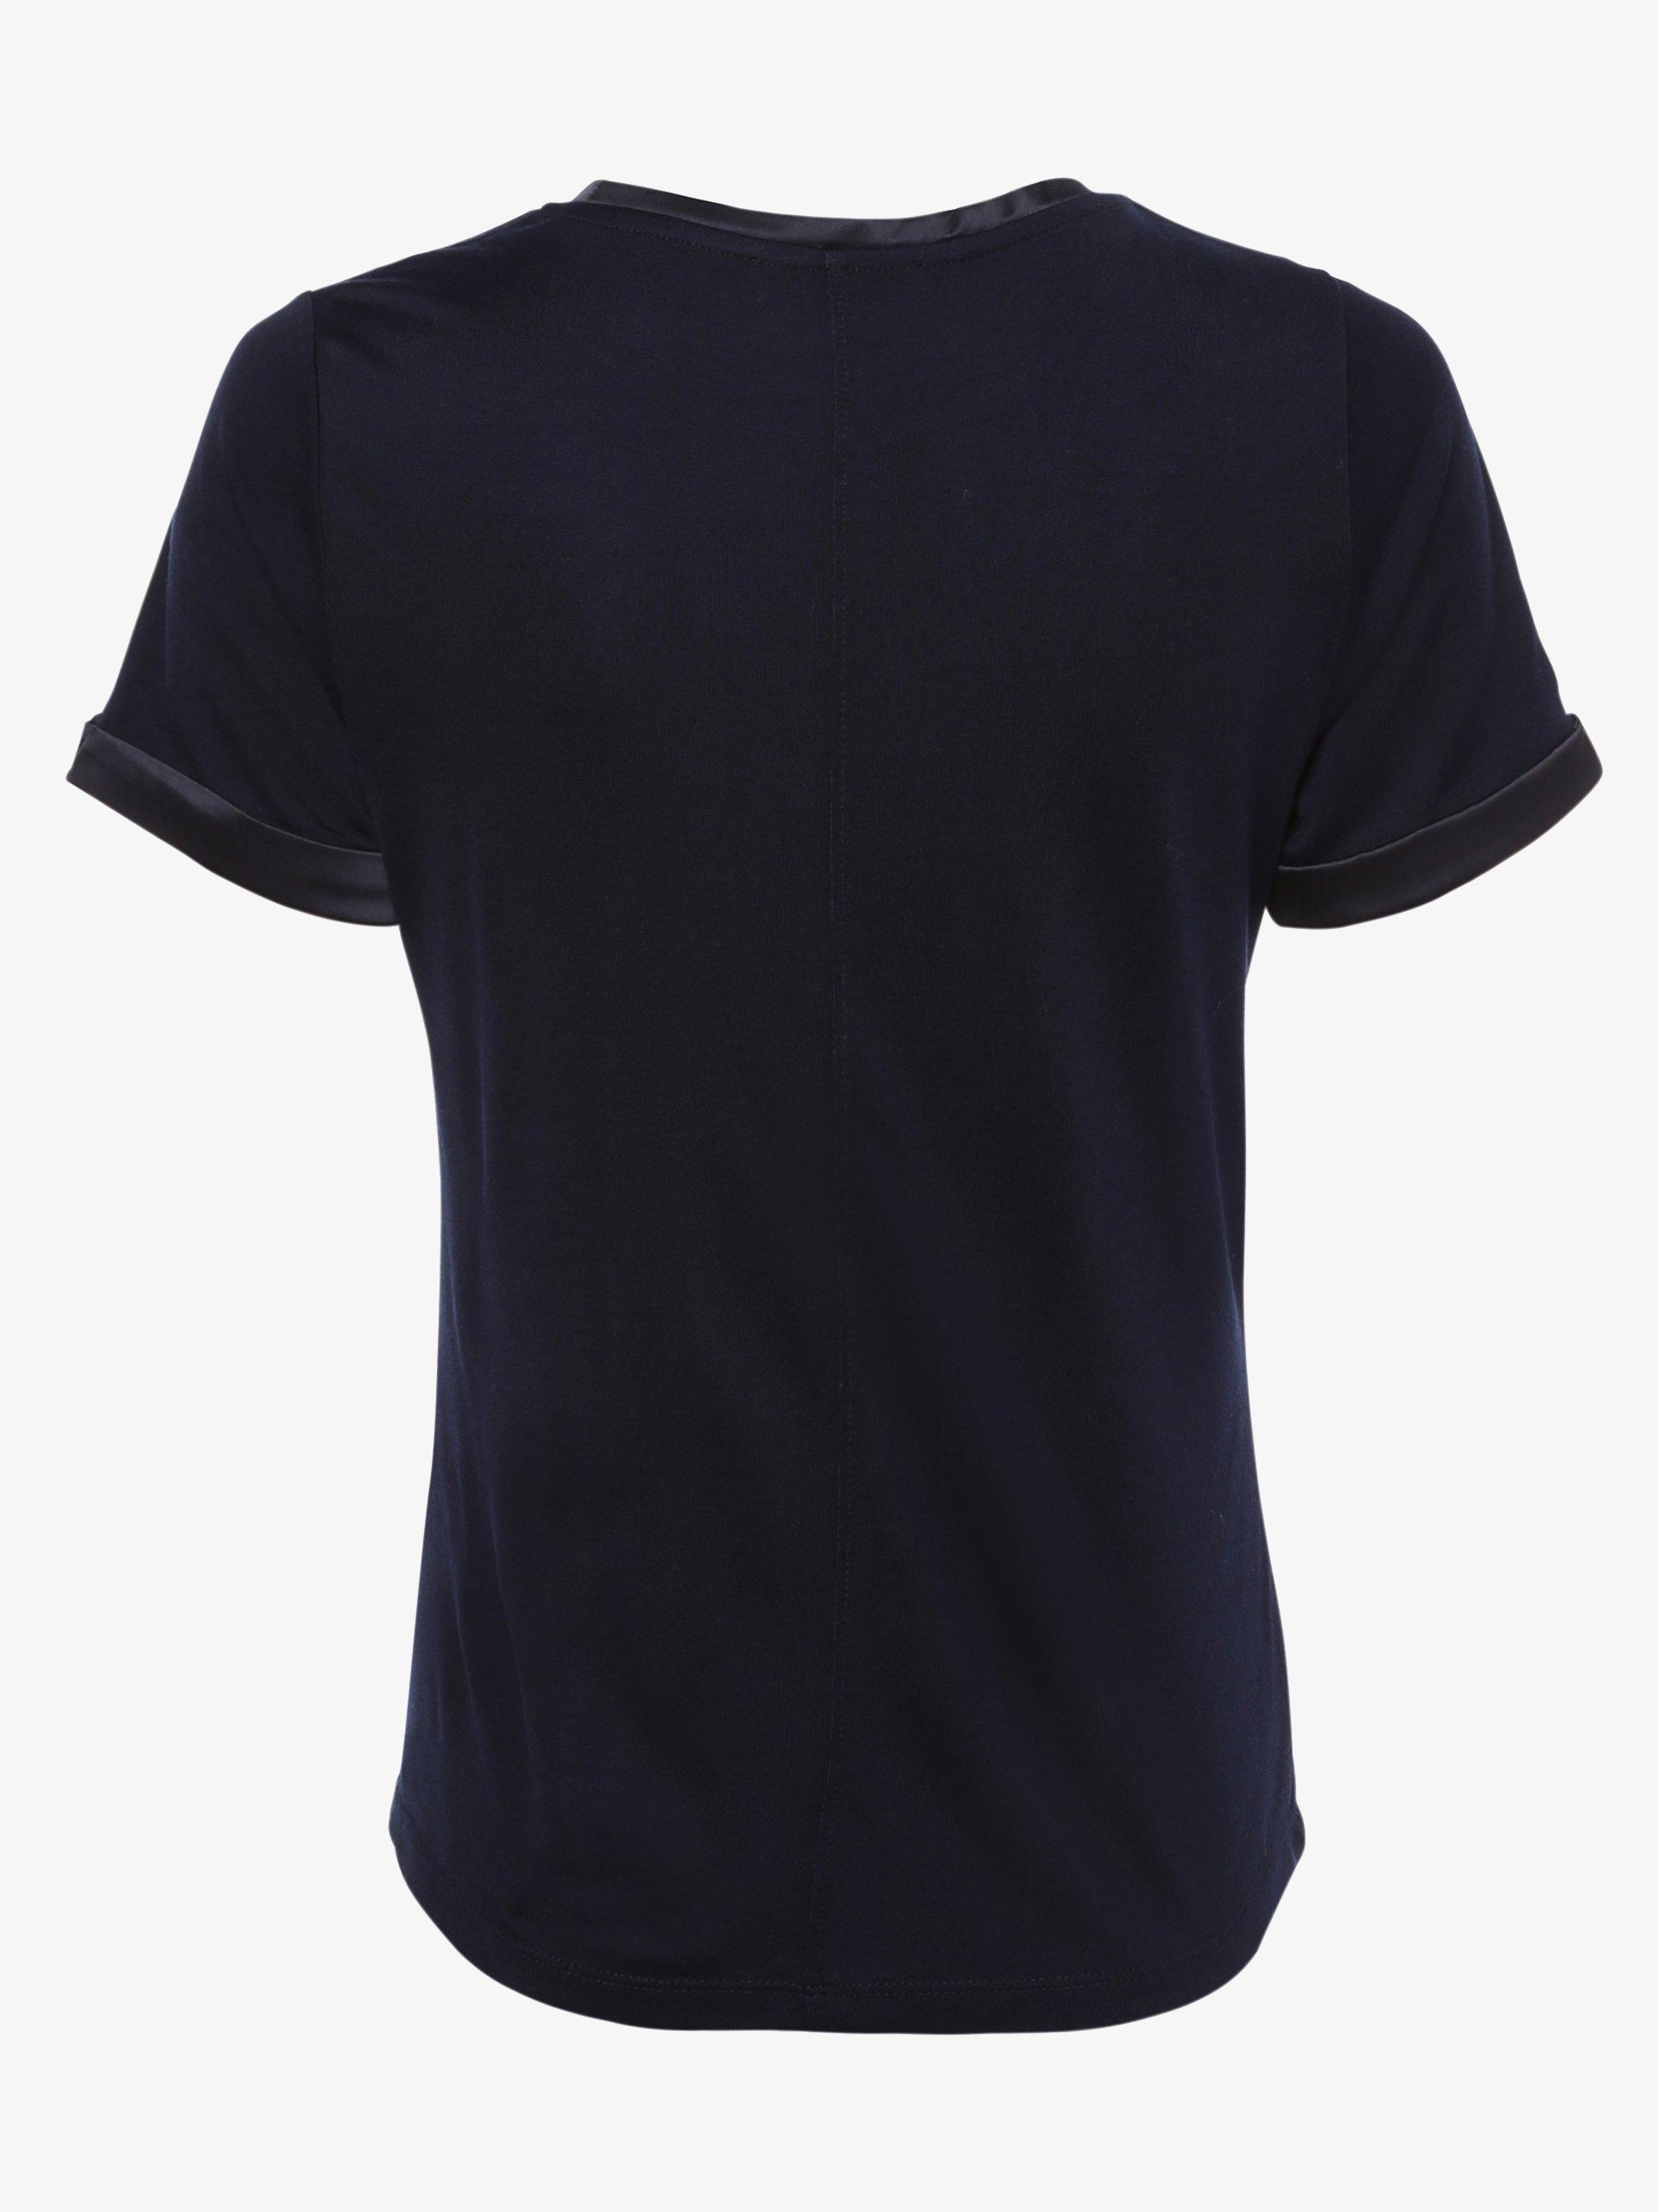 Apriori Damen T-Shirt - Coordinates